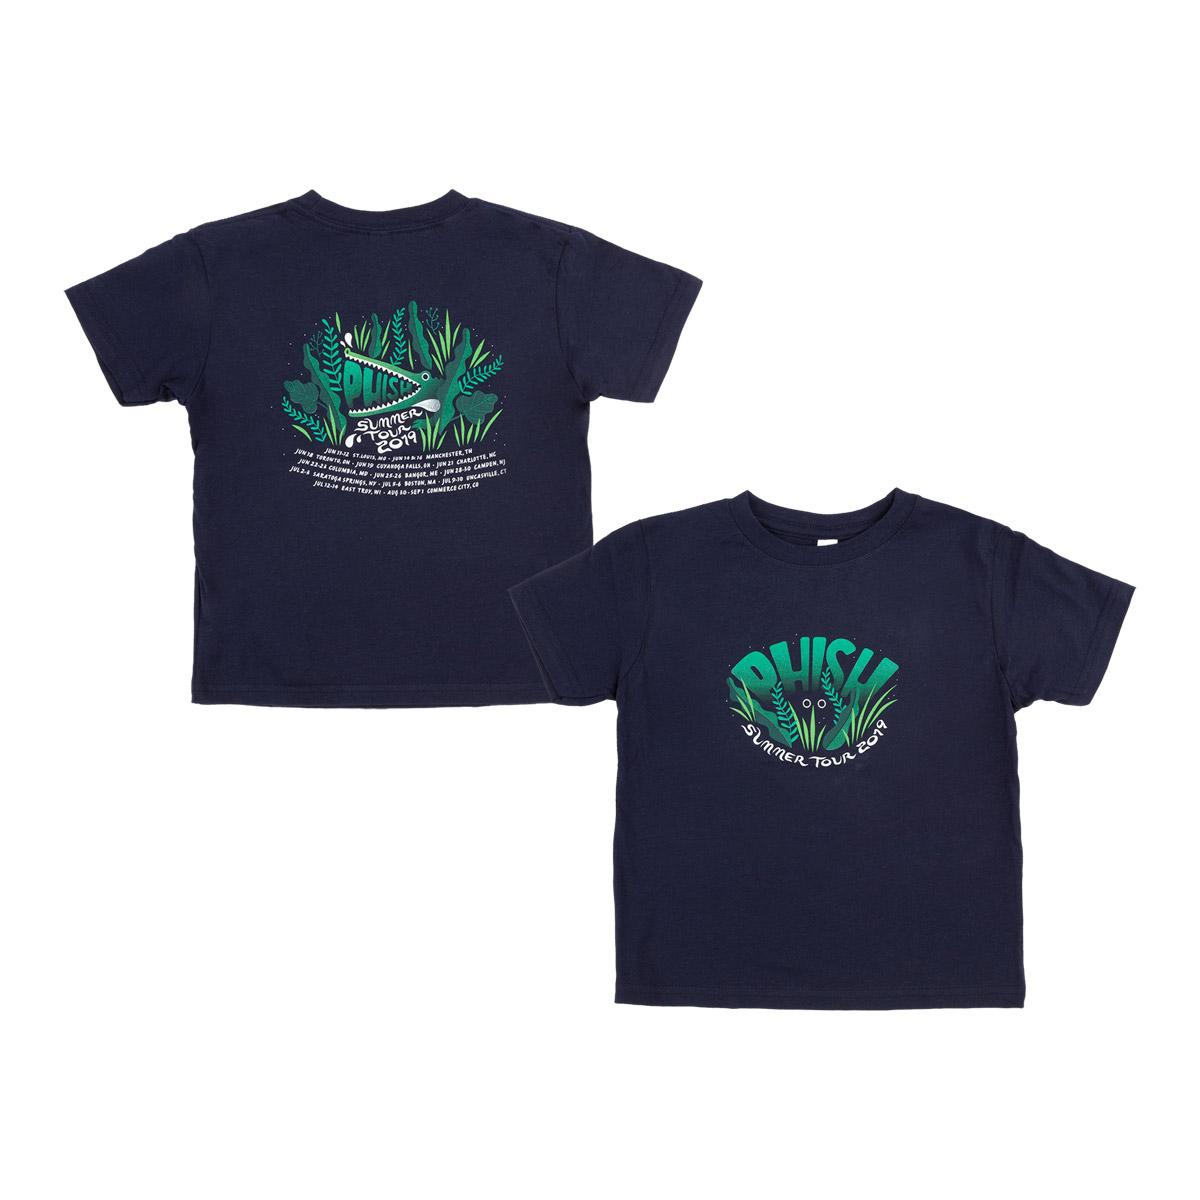 2019 Summer Tour Swampy Toddler T-shirt